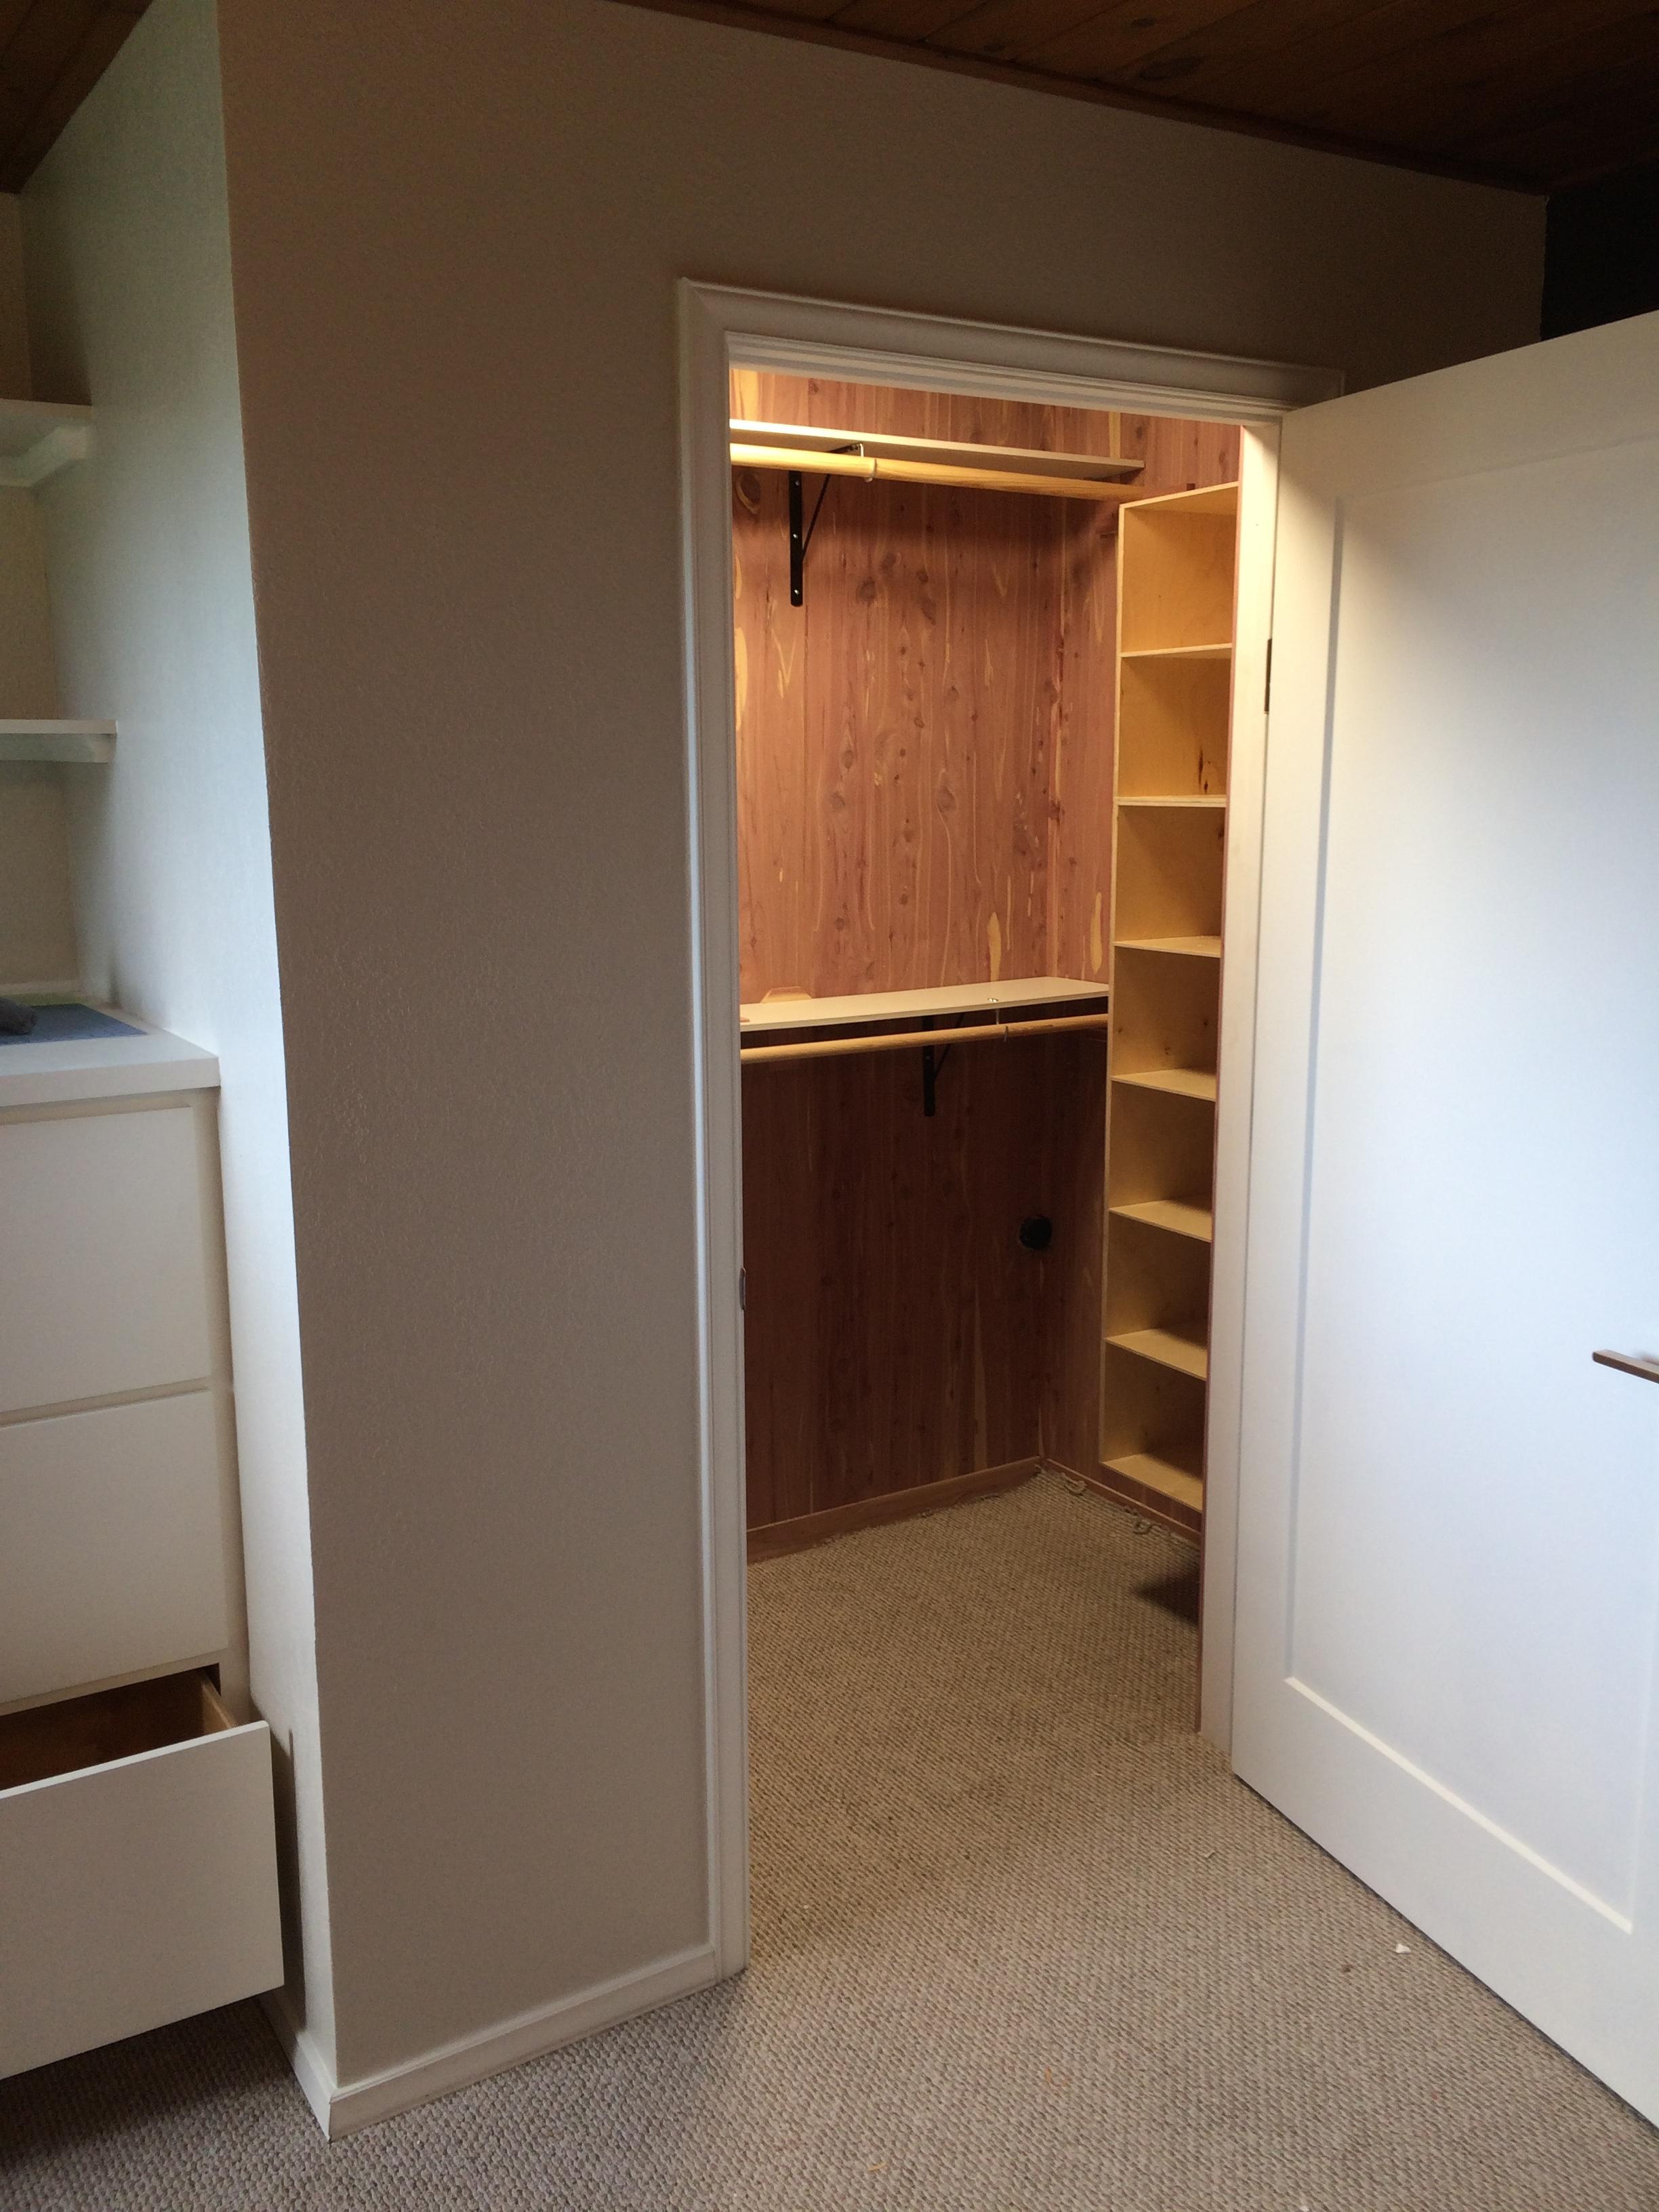 Cedar lined closet with cubbies